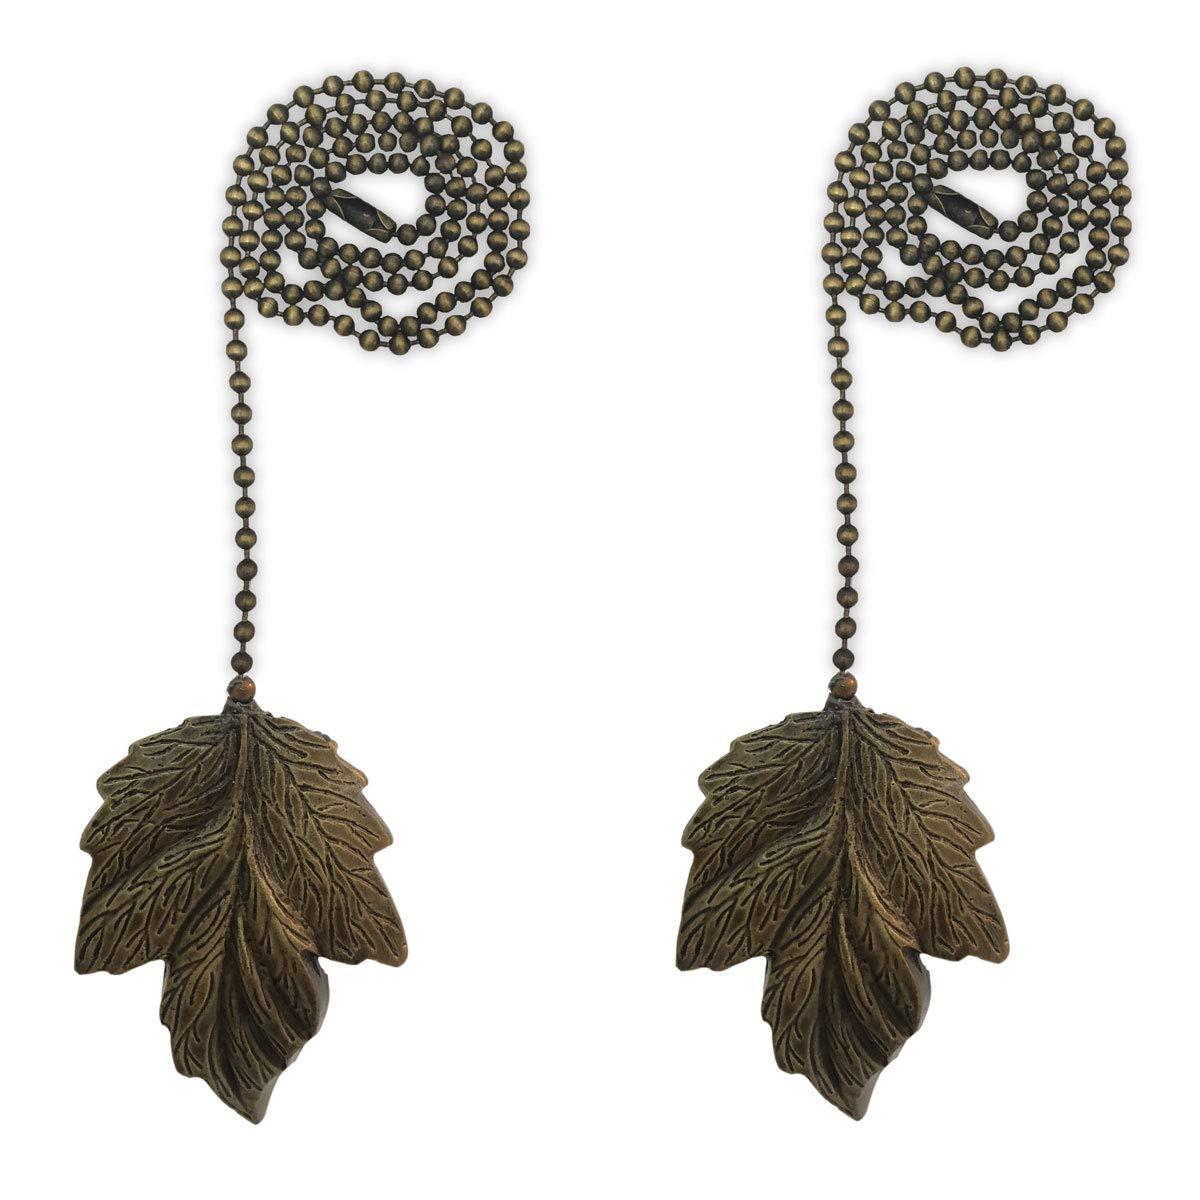 Royal Designs FP-1006AB-2 Leaf Design Fan Pull Chain, Antique Brass, Set of 2 by Royal Designs, Inc